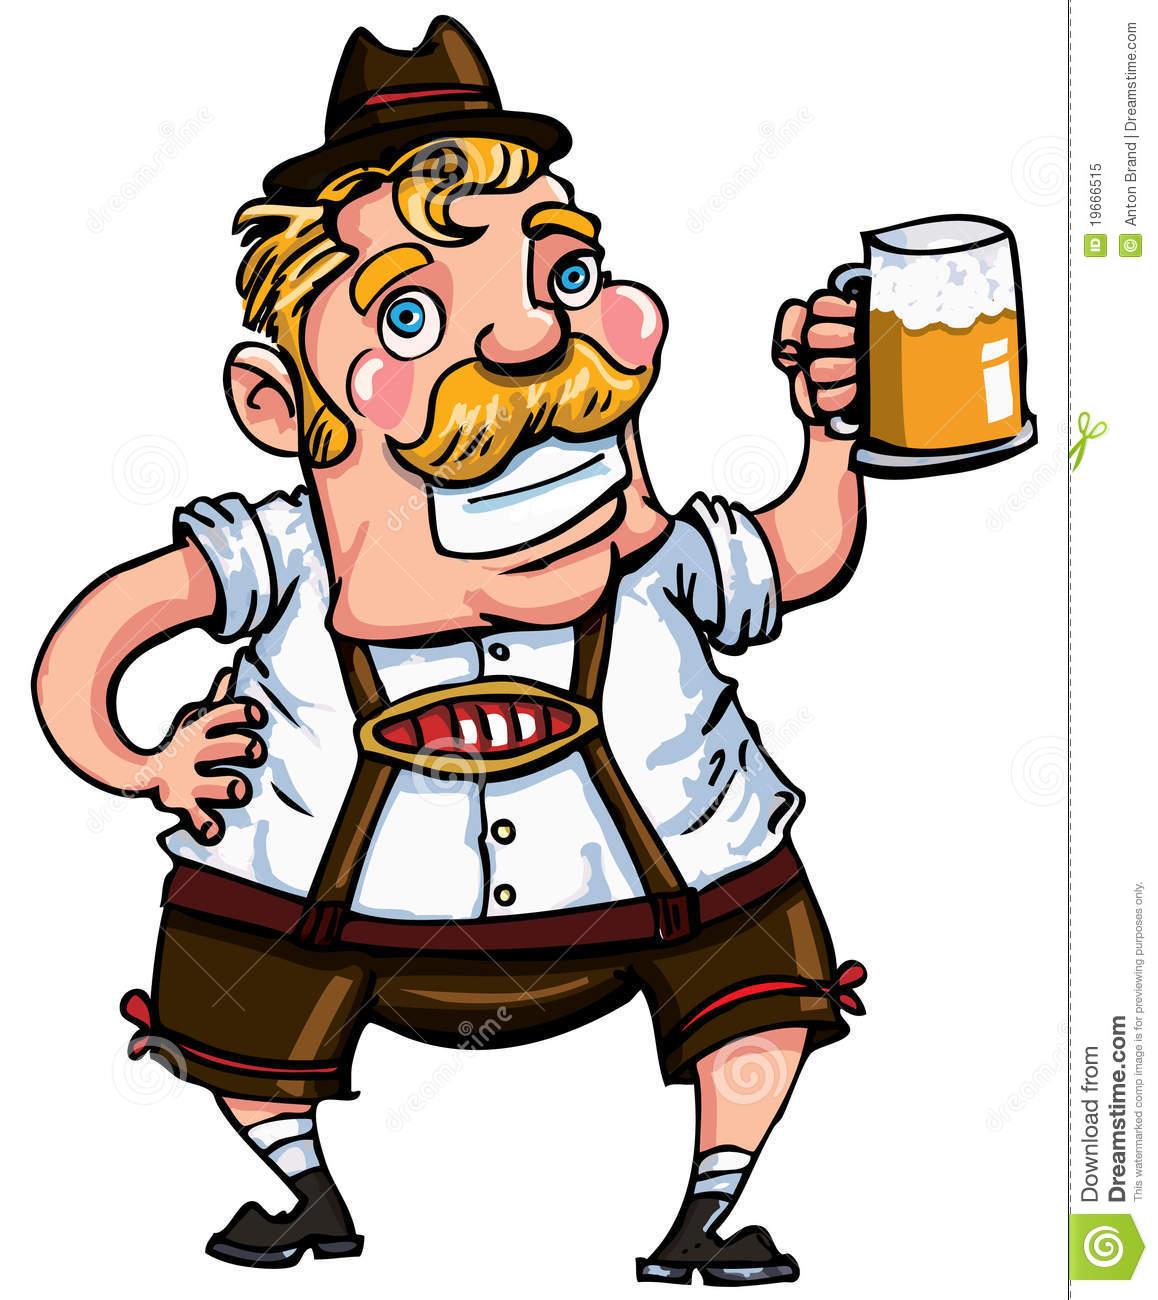 German clipart cartoon. Free download best